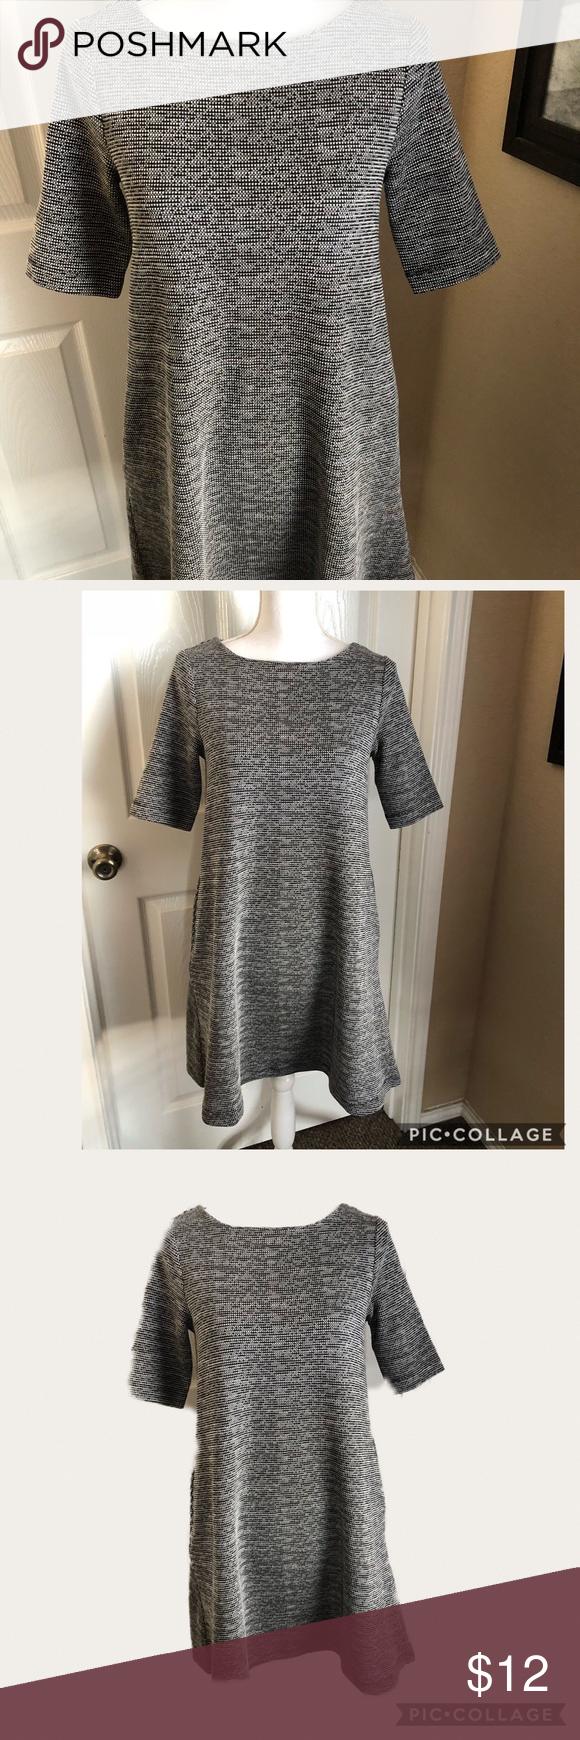 Paraphrase Sleeved Grey A Line Work Chic Dres Clothe Design Dress